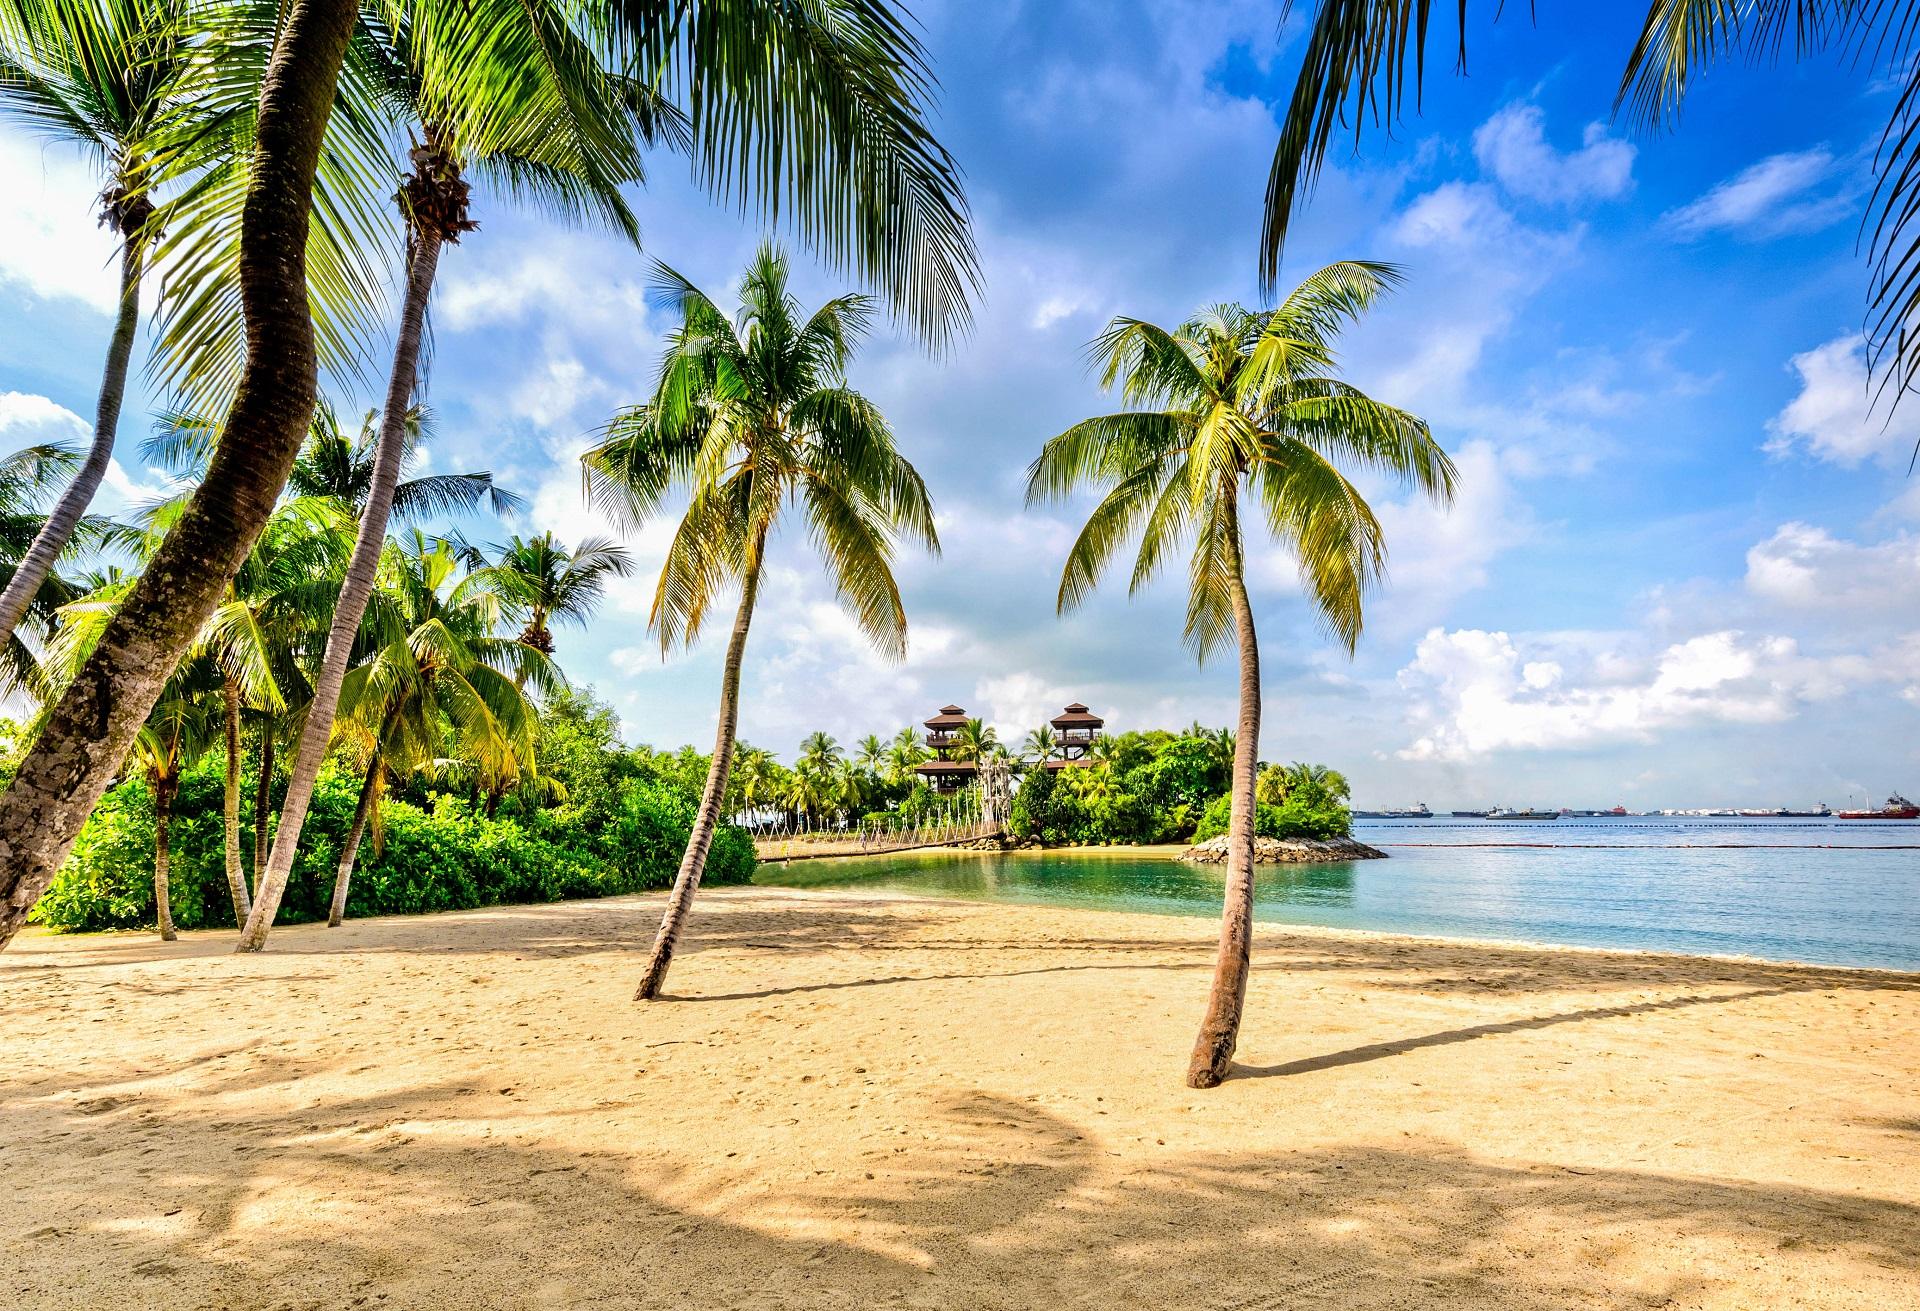 Bali Beach Holiday House